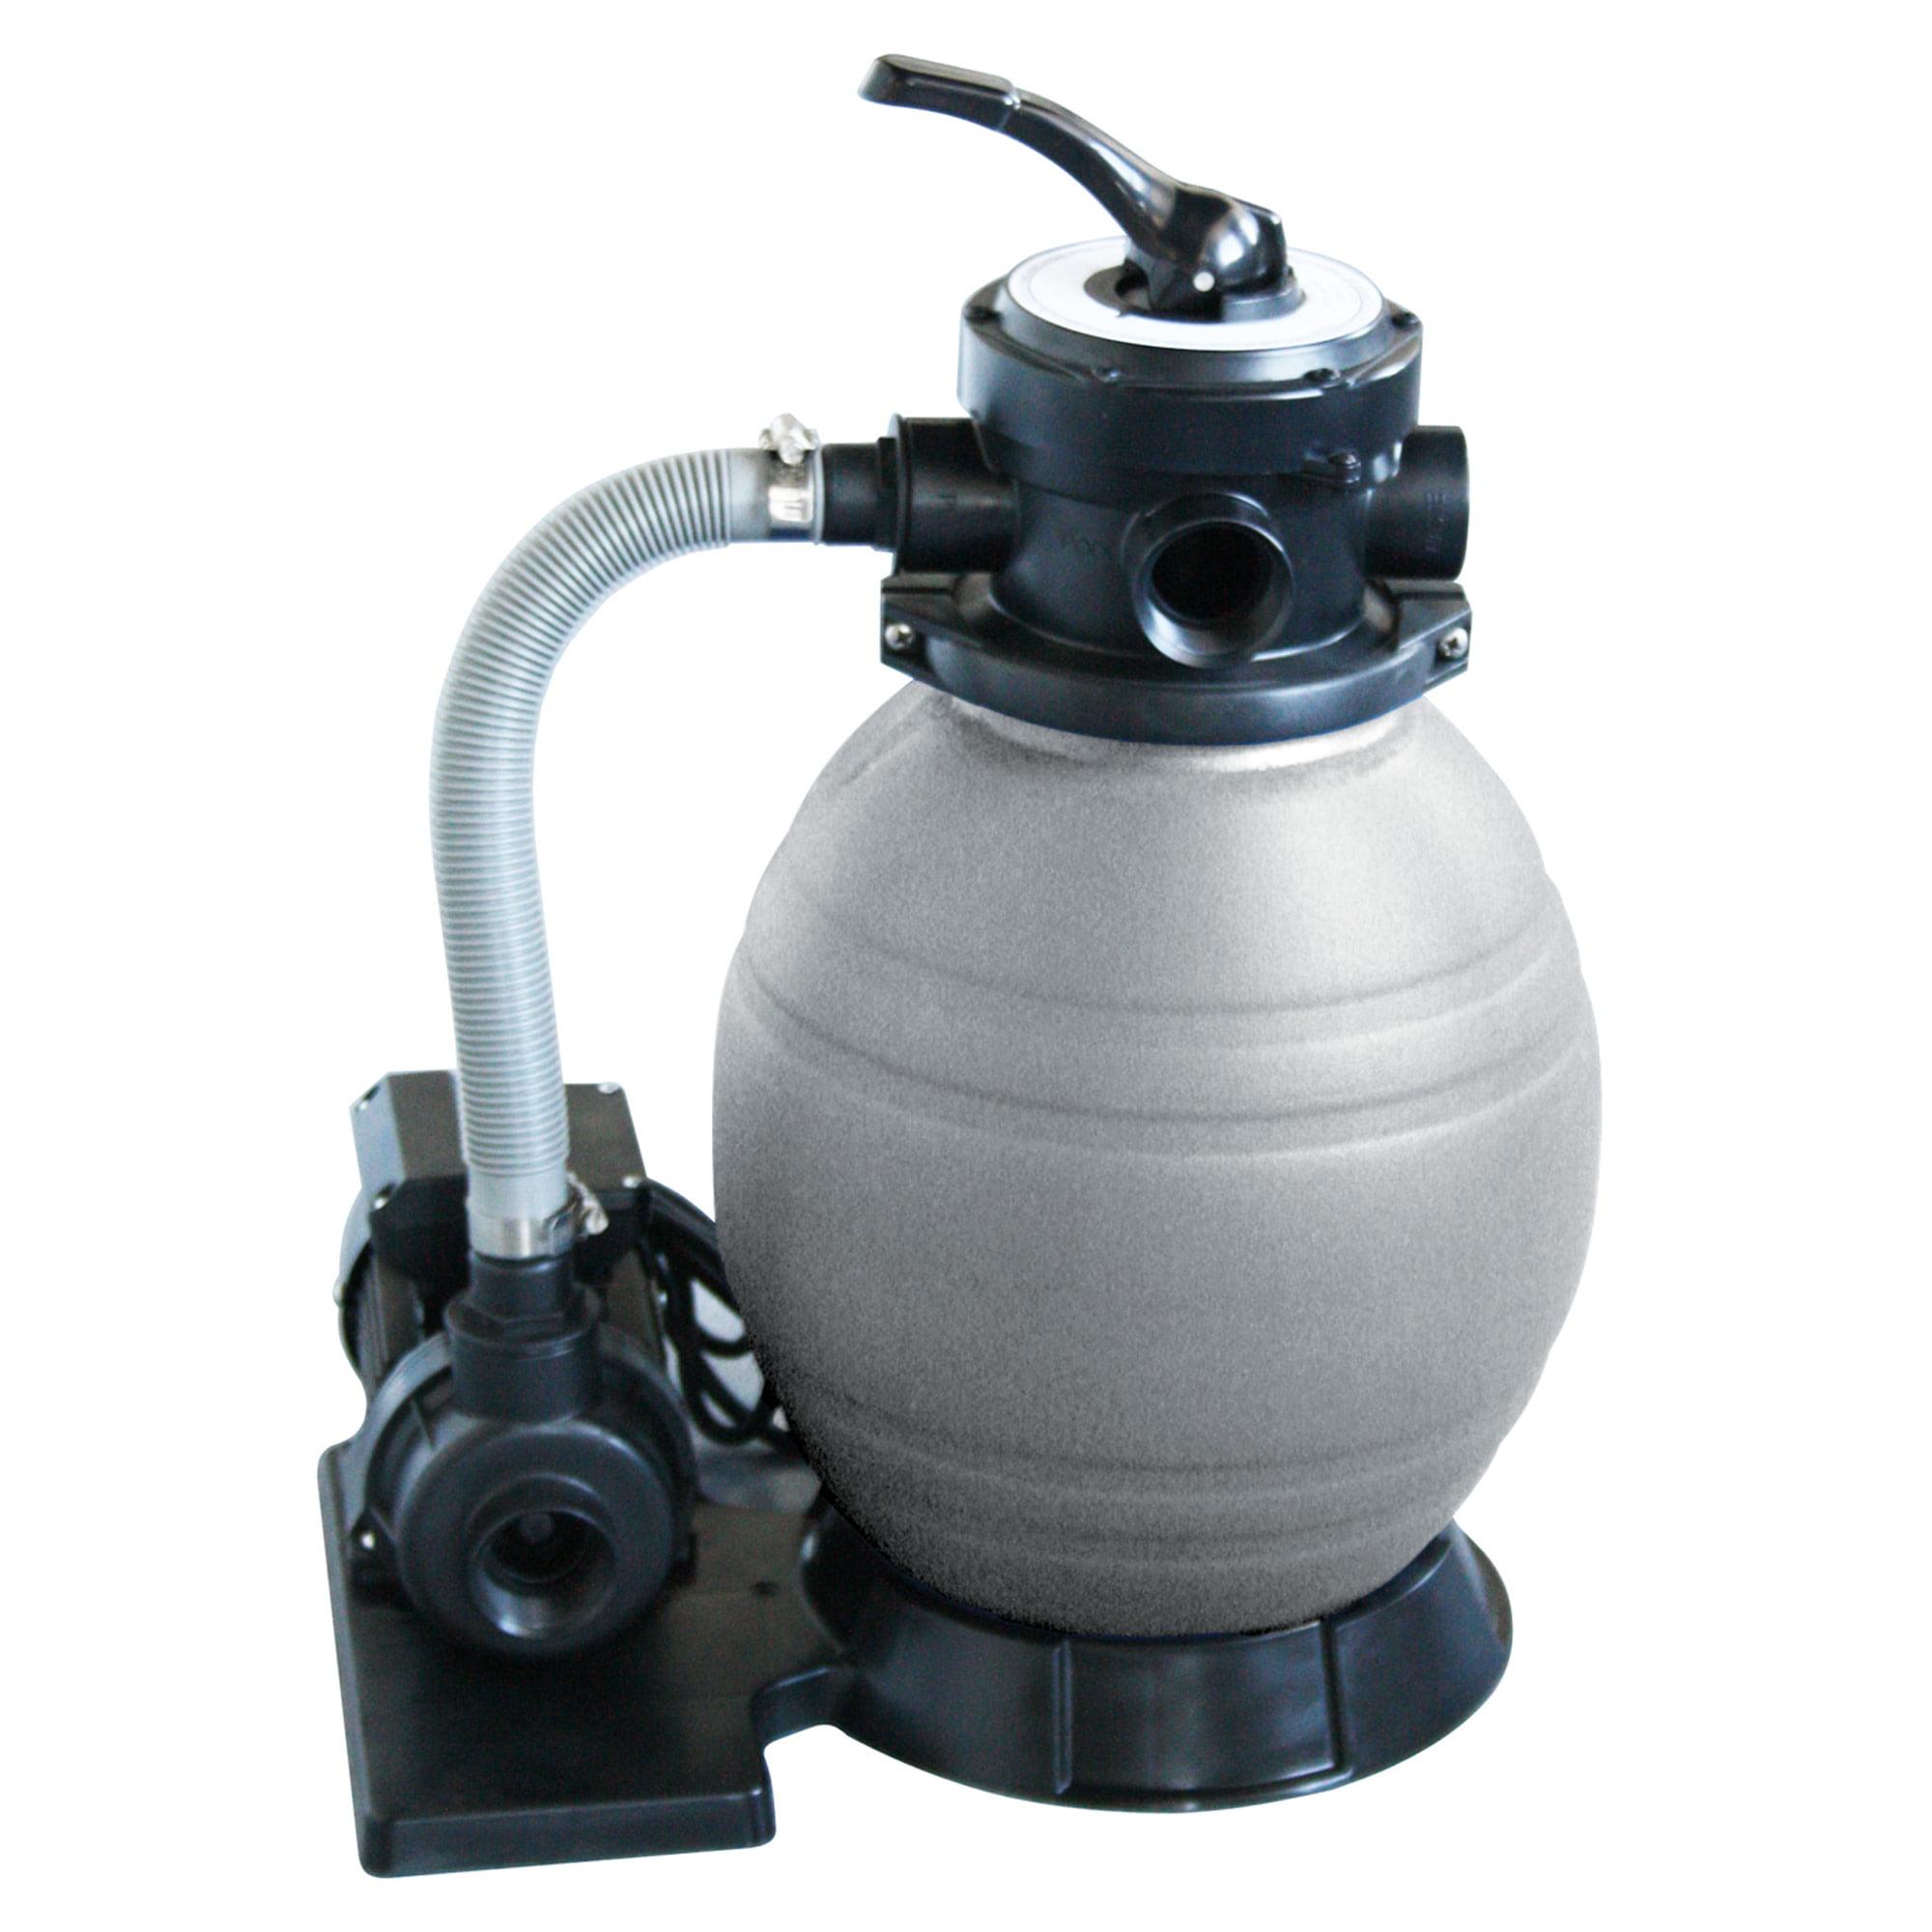 Hook up sand filter pump above ground pool